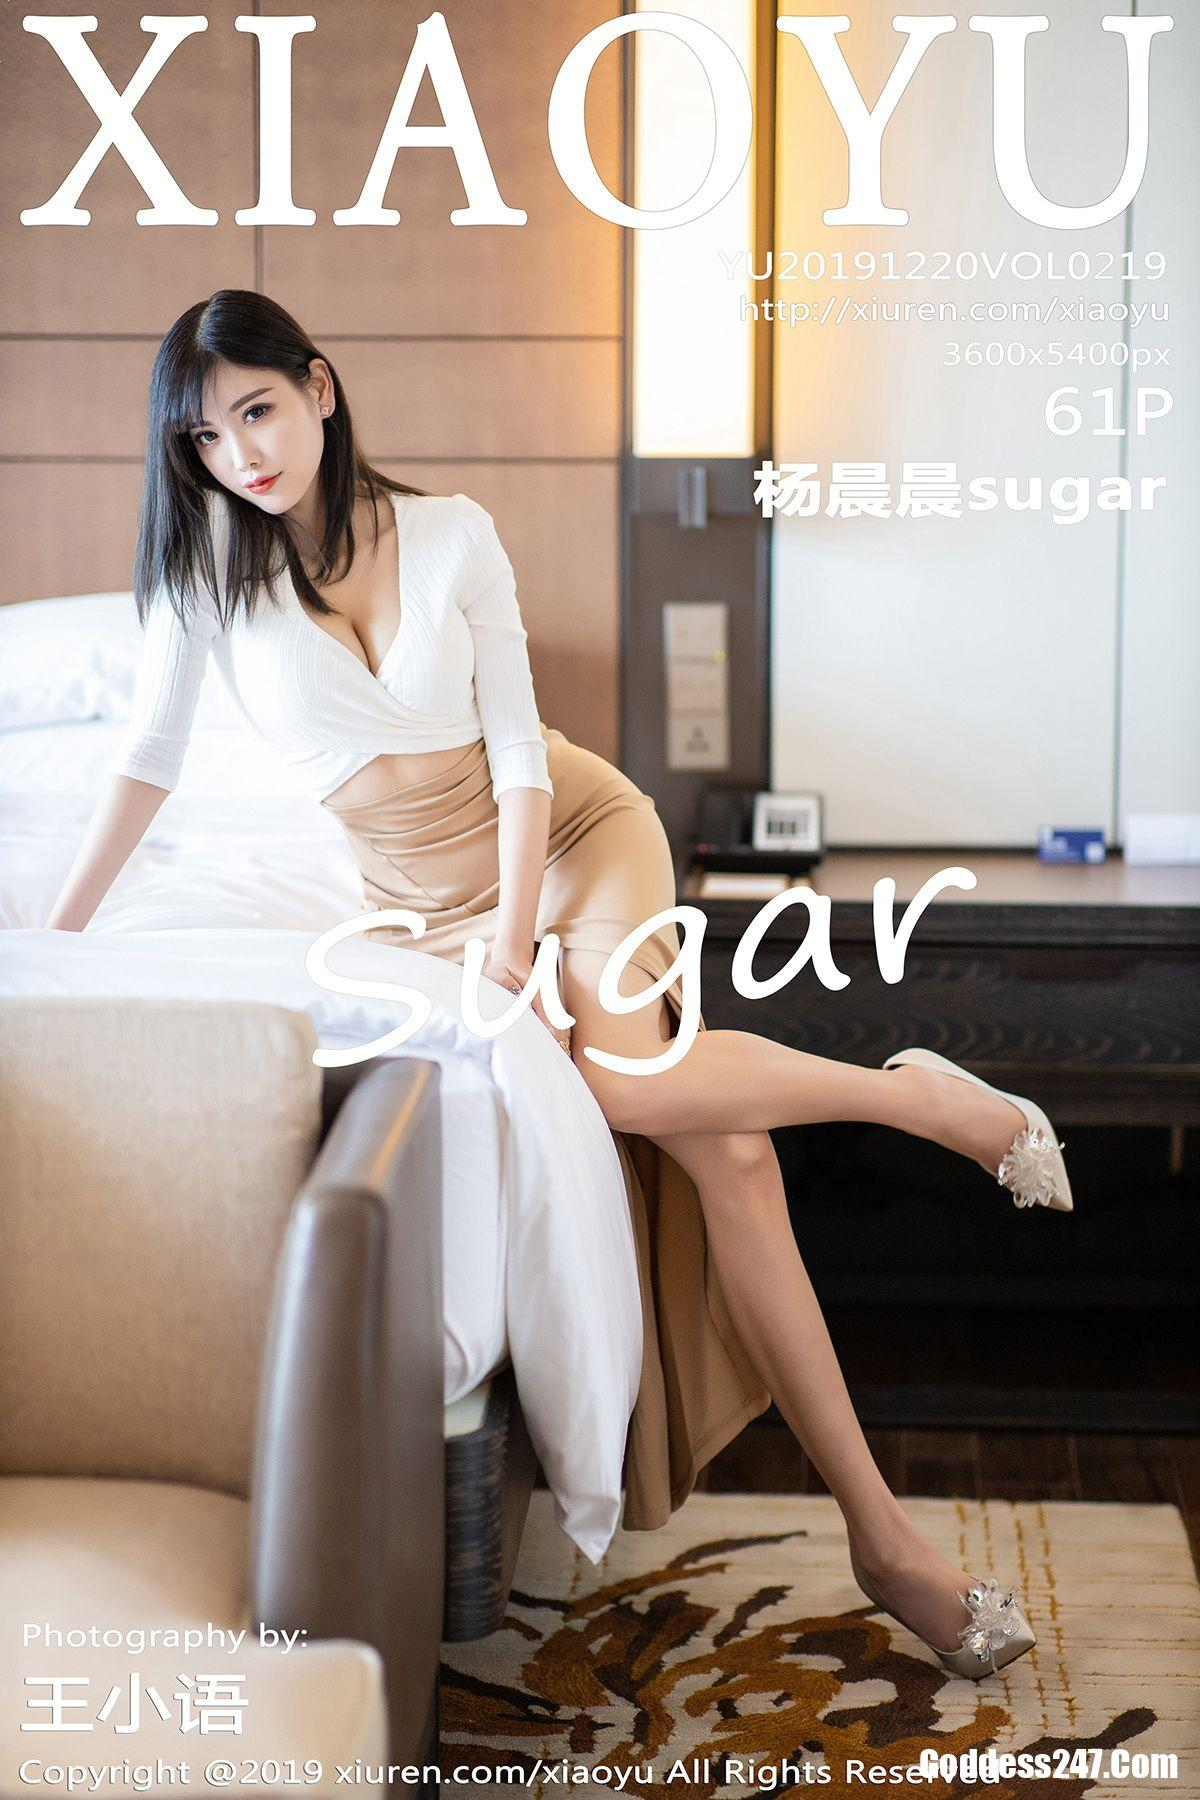 XiaoYu Vol.219 杨晨晨sugar